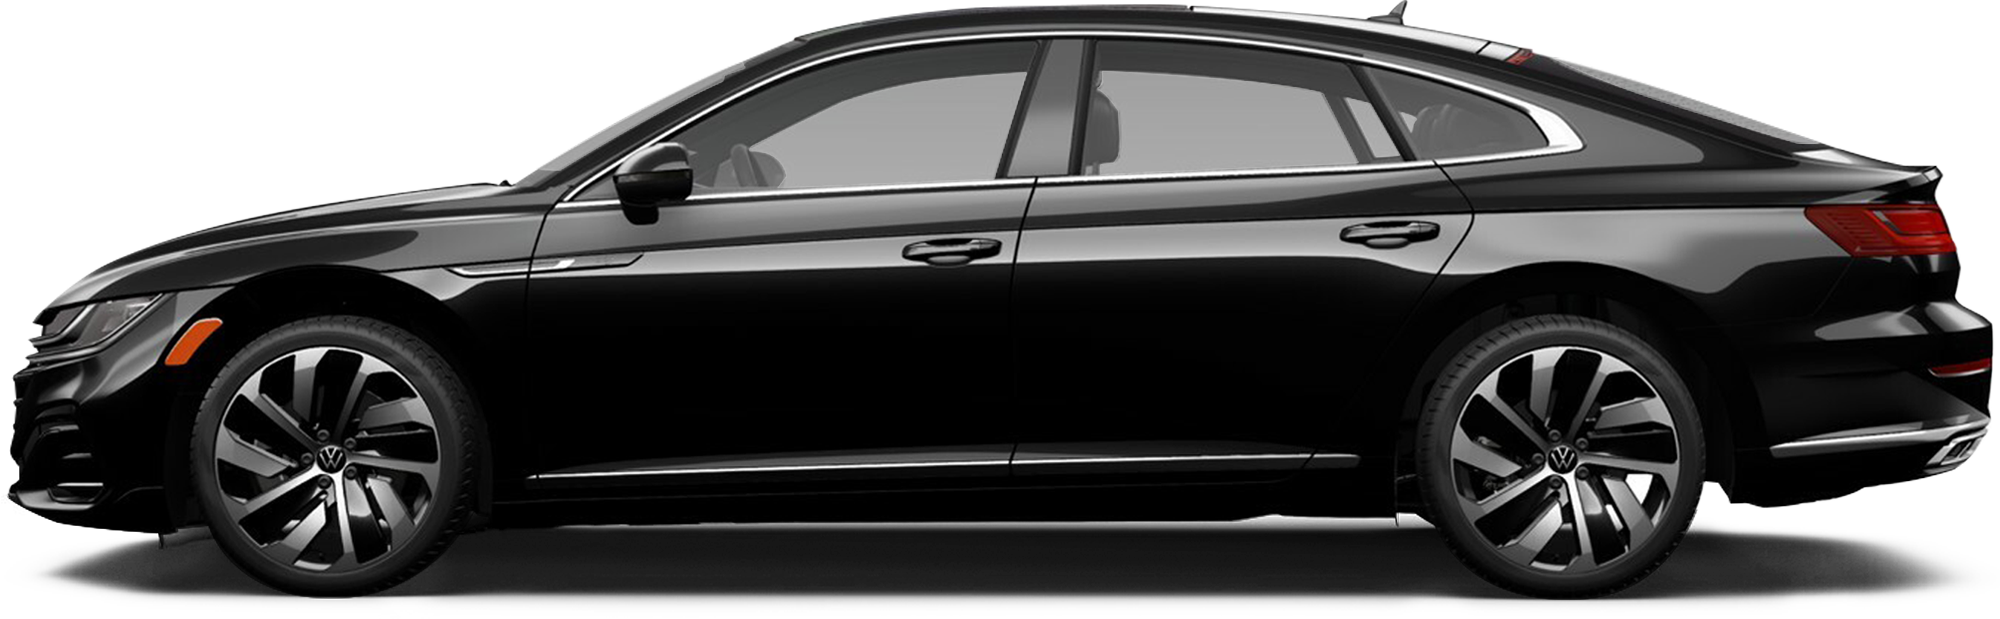 2021 Volkswagen Arteon Sedan 2.0T SEL Premium R-Line 4MOTION